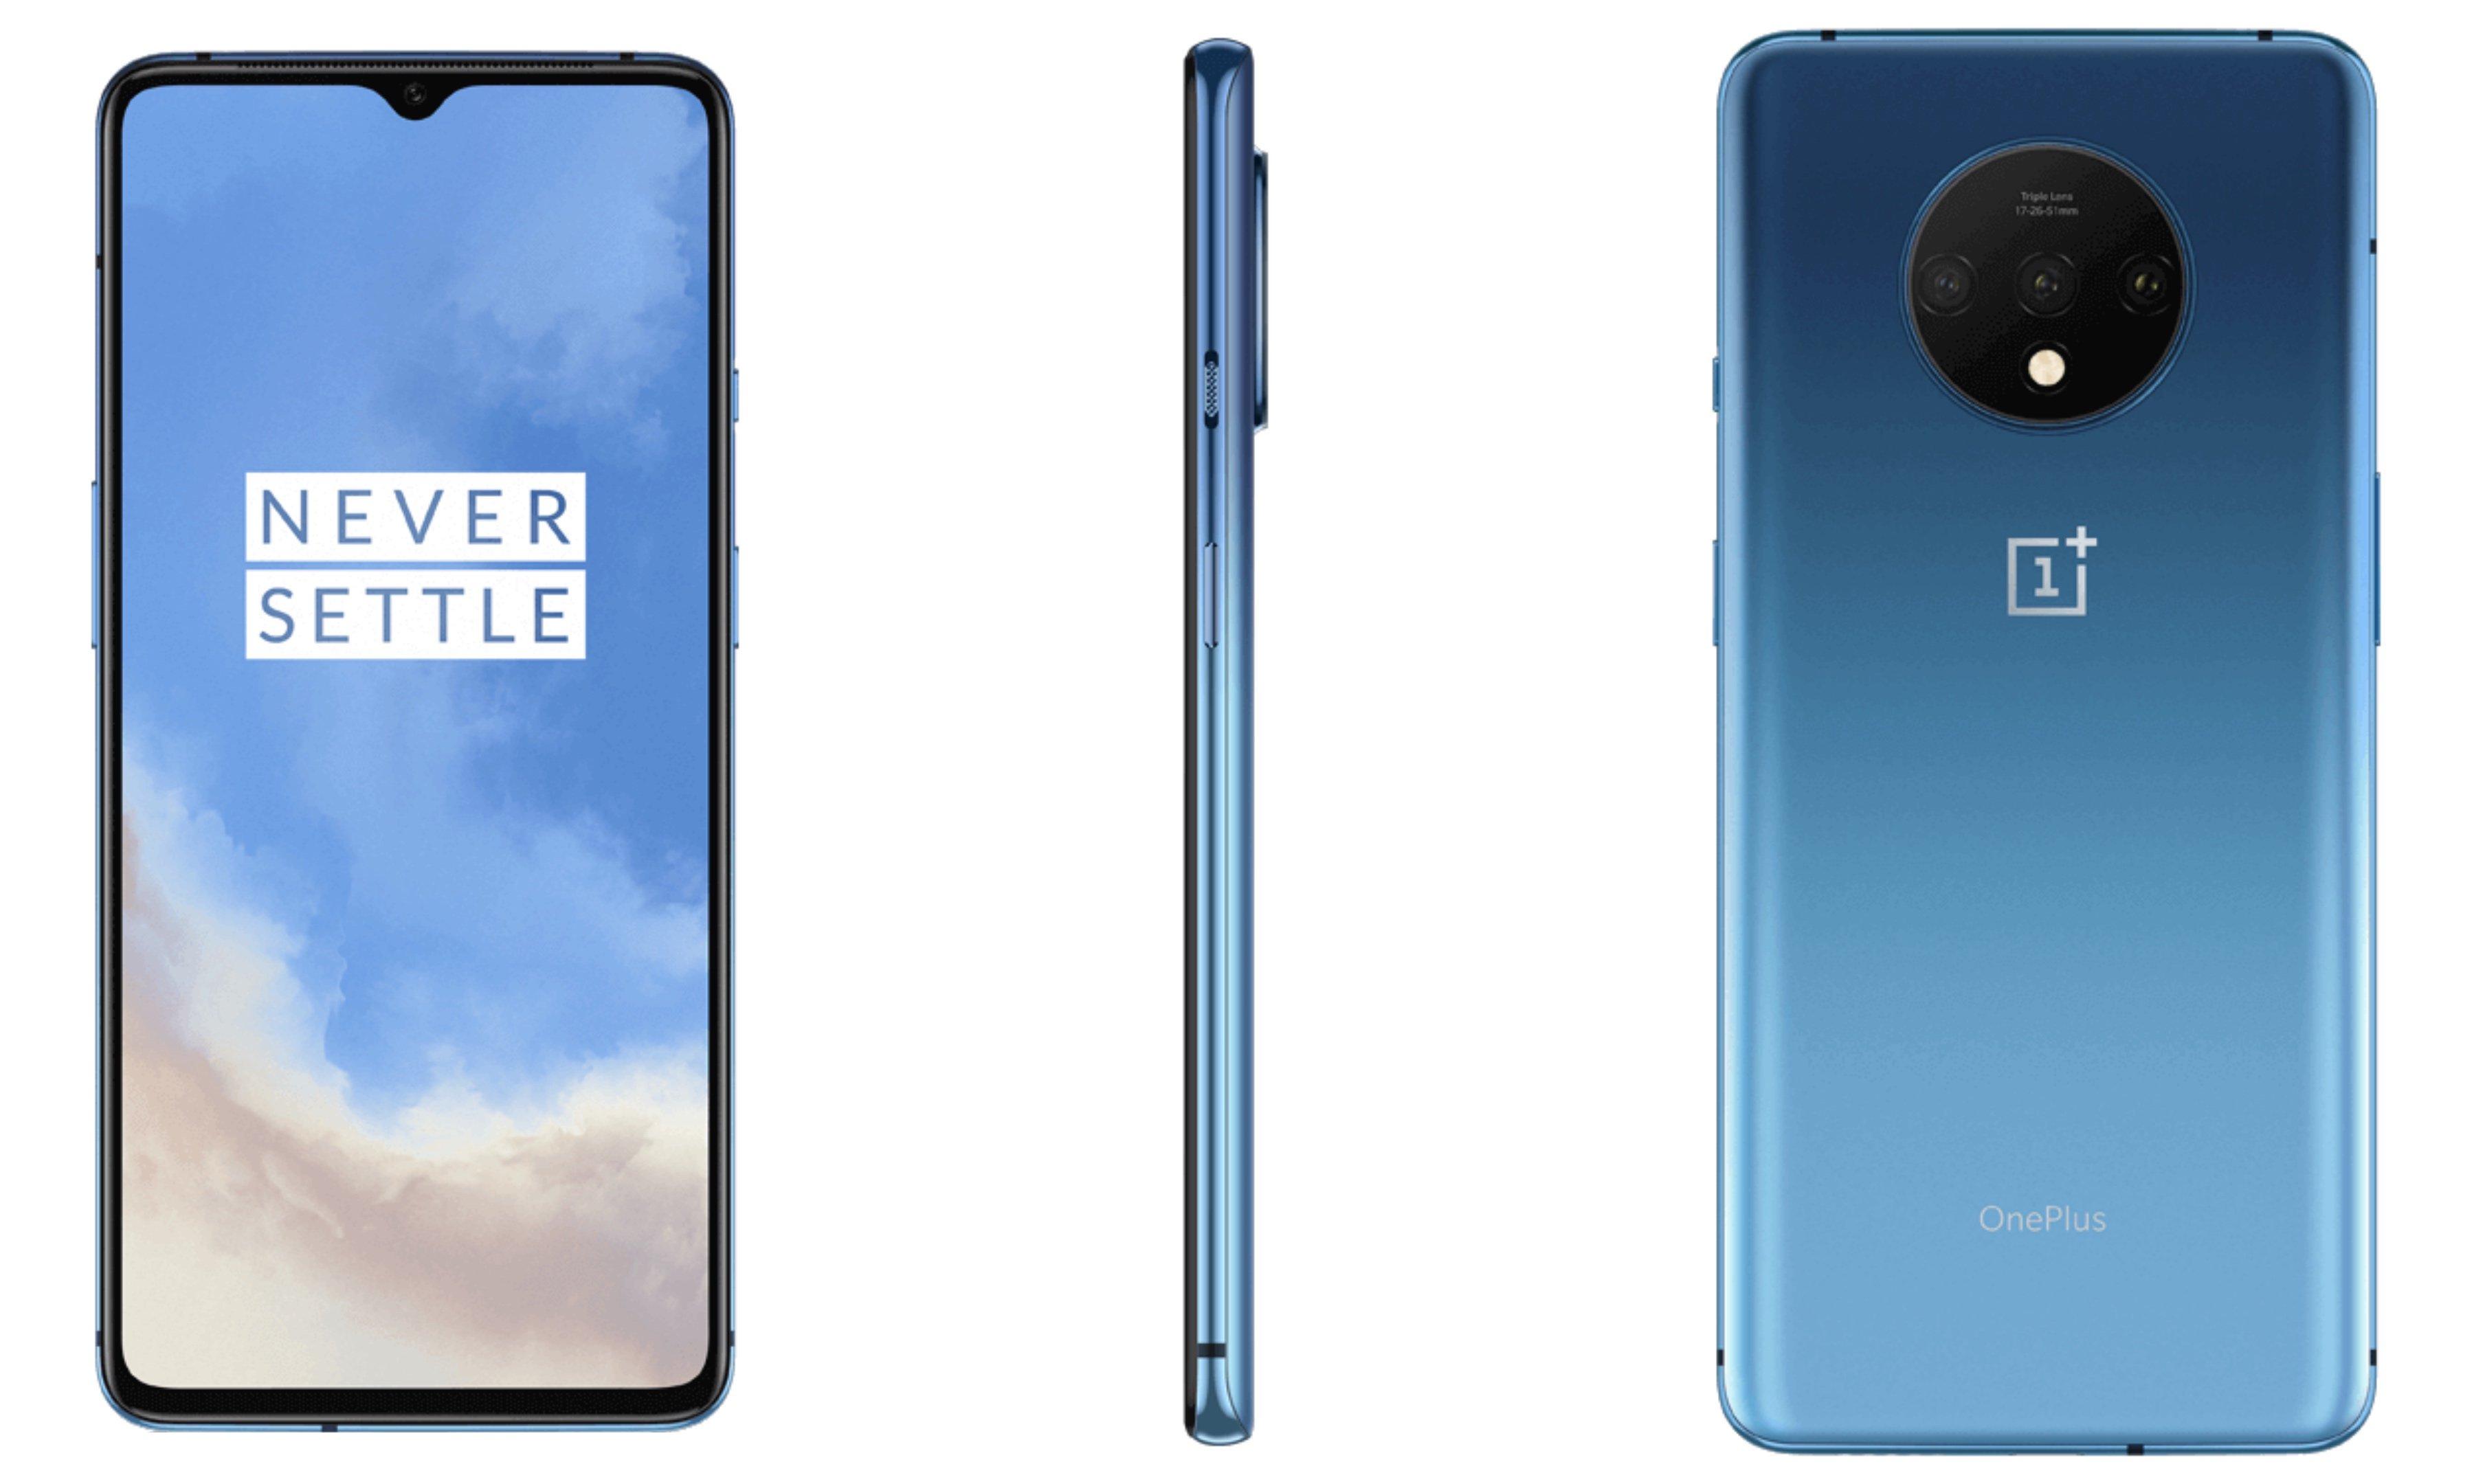 OnePlus 7T in Glacier Blue Color